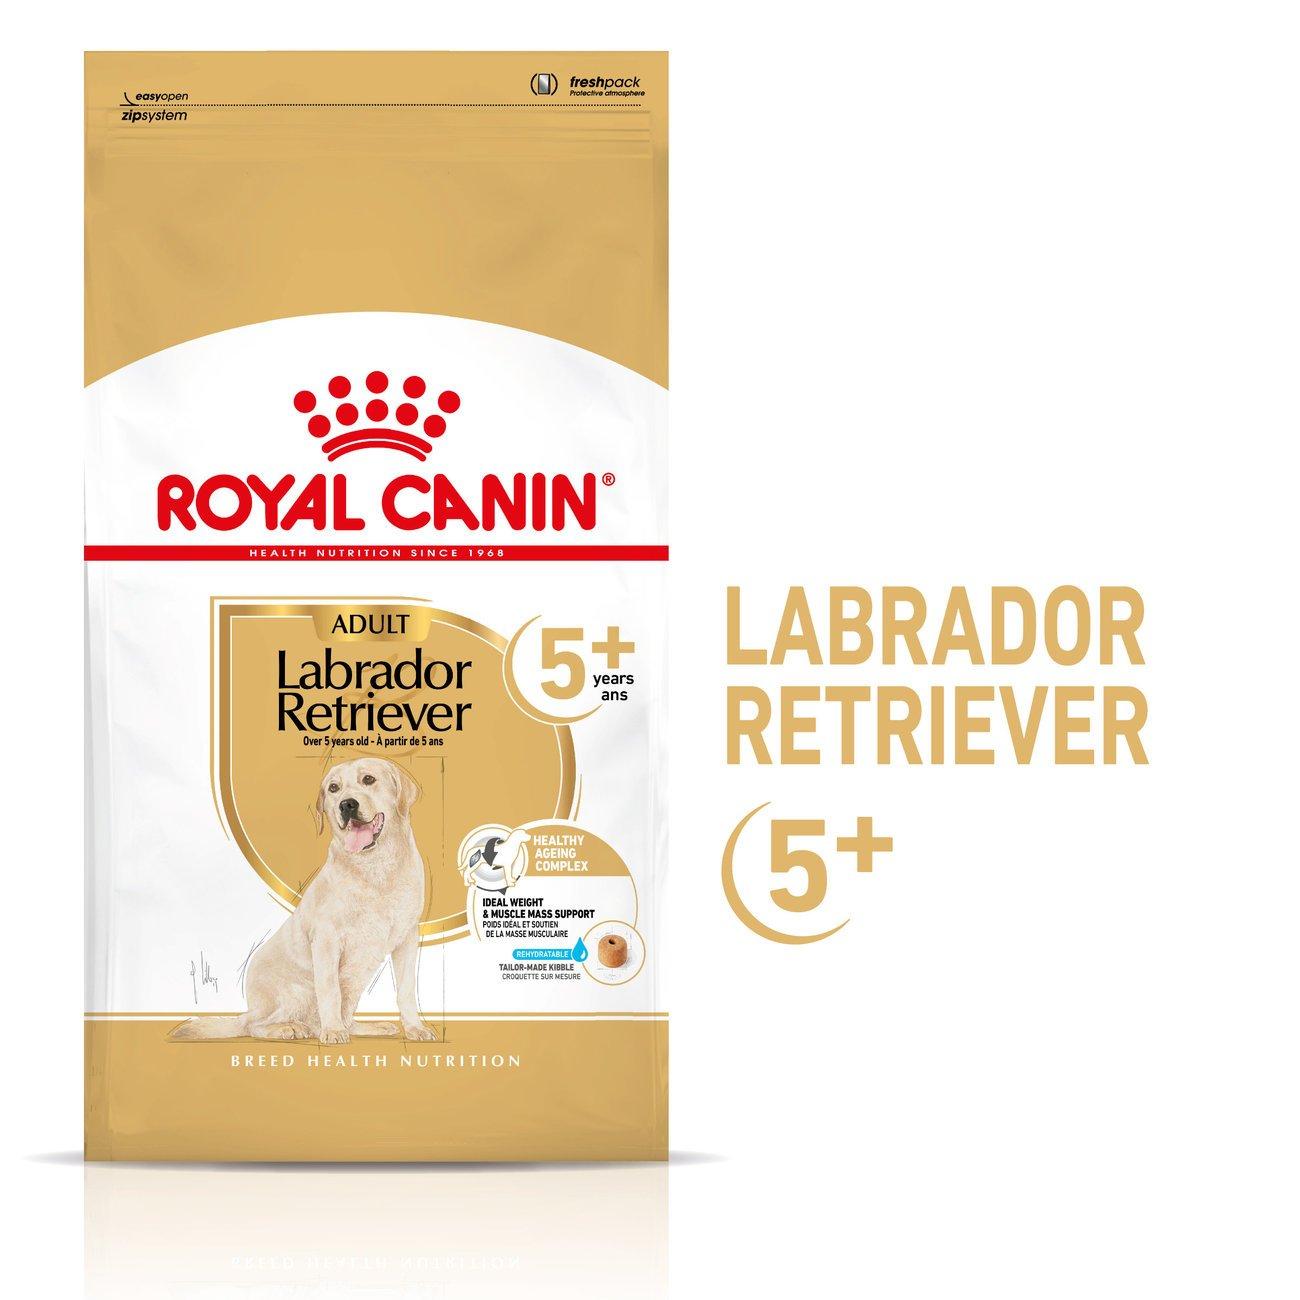 Royal Canin Labrador Retriver Trockenfutter 5+, 12 kg